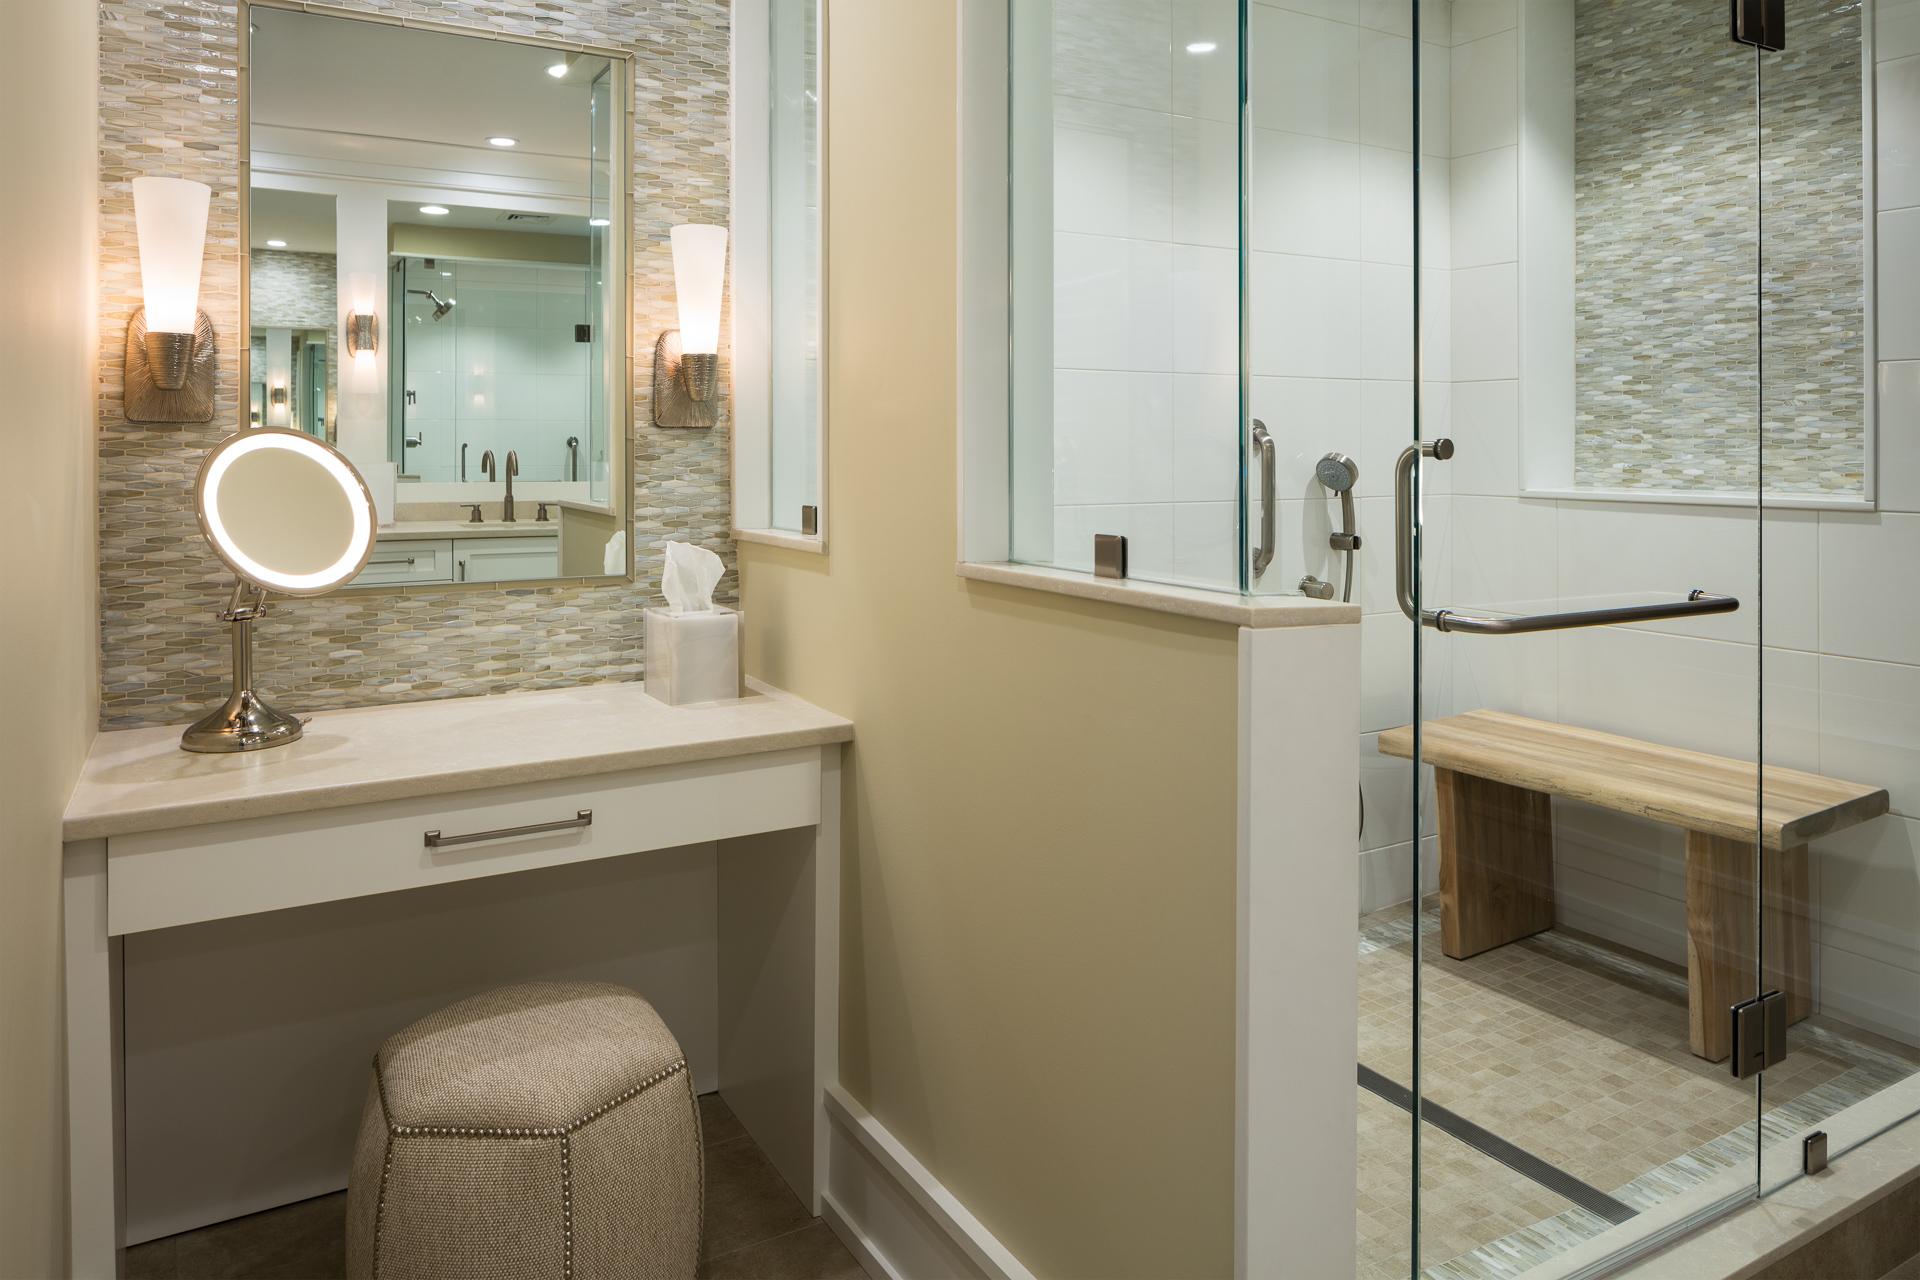 9 Diy Bathroom Remodeling Ideas Interior Decorator New Jersey